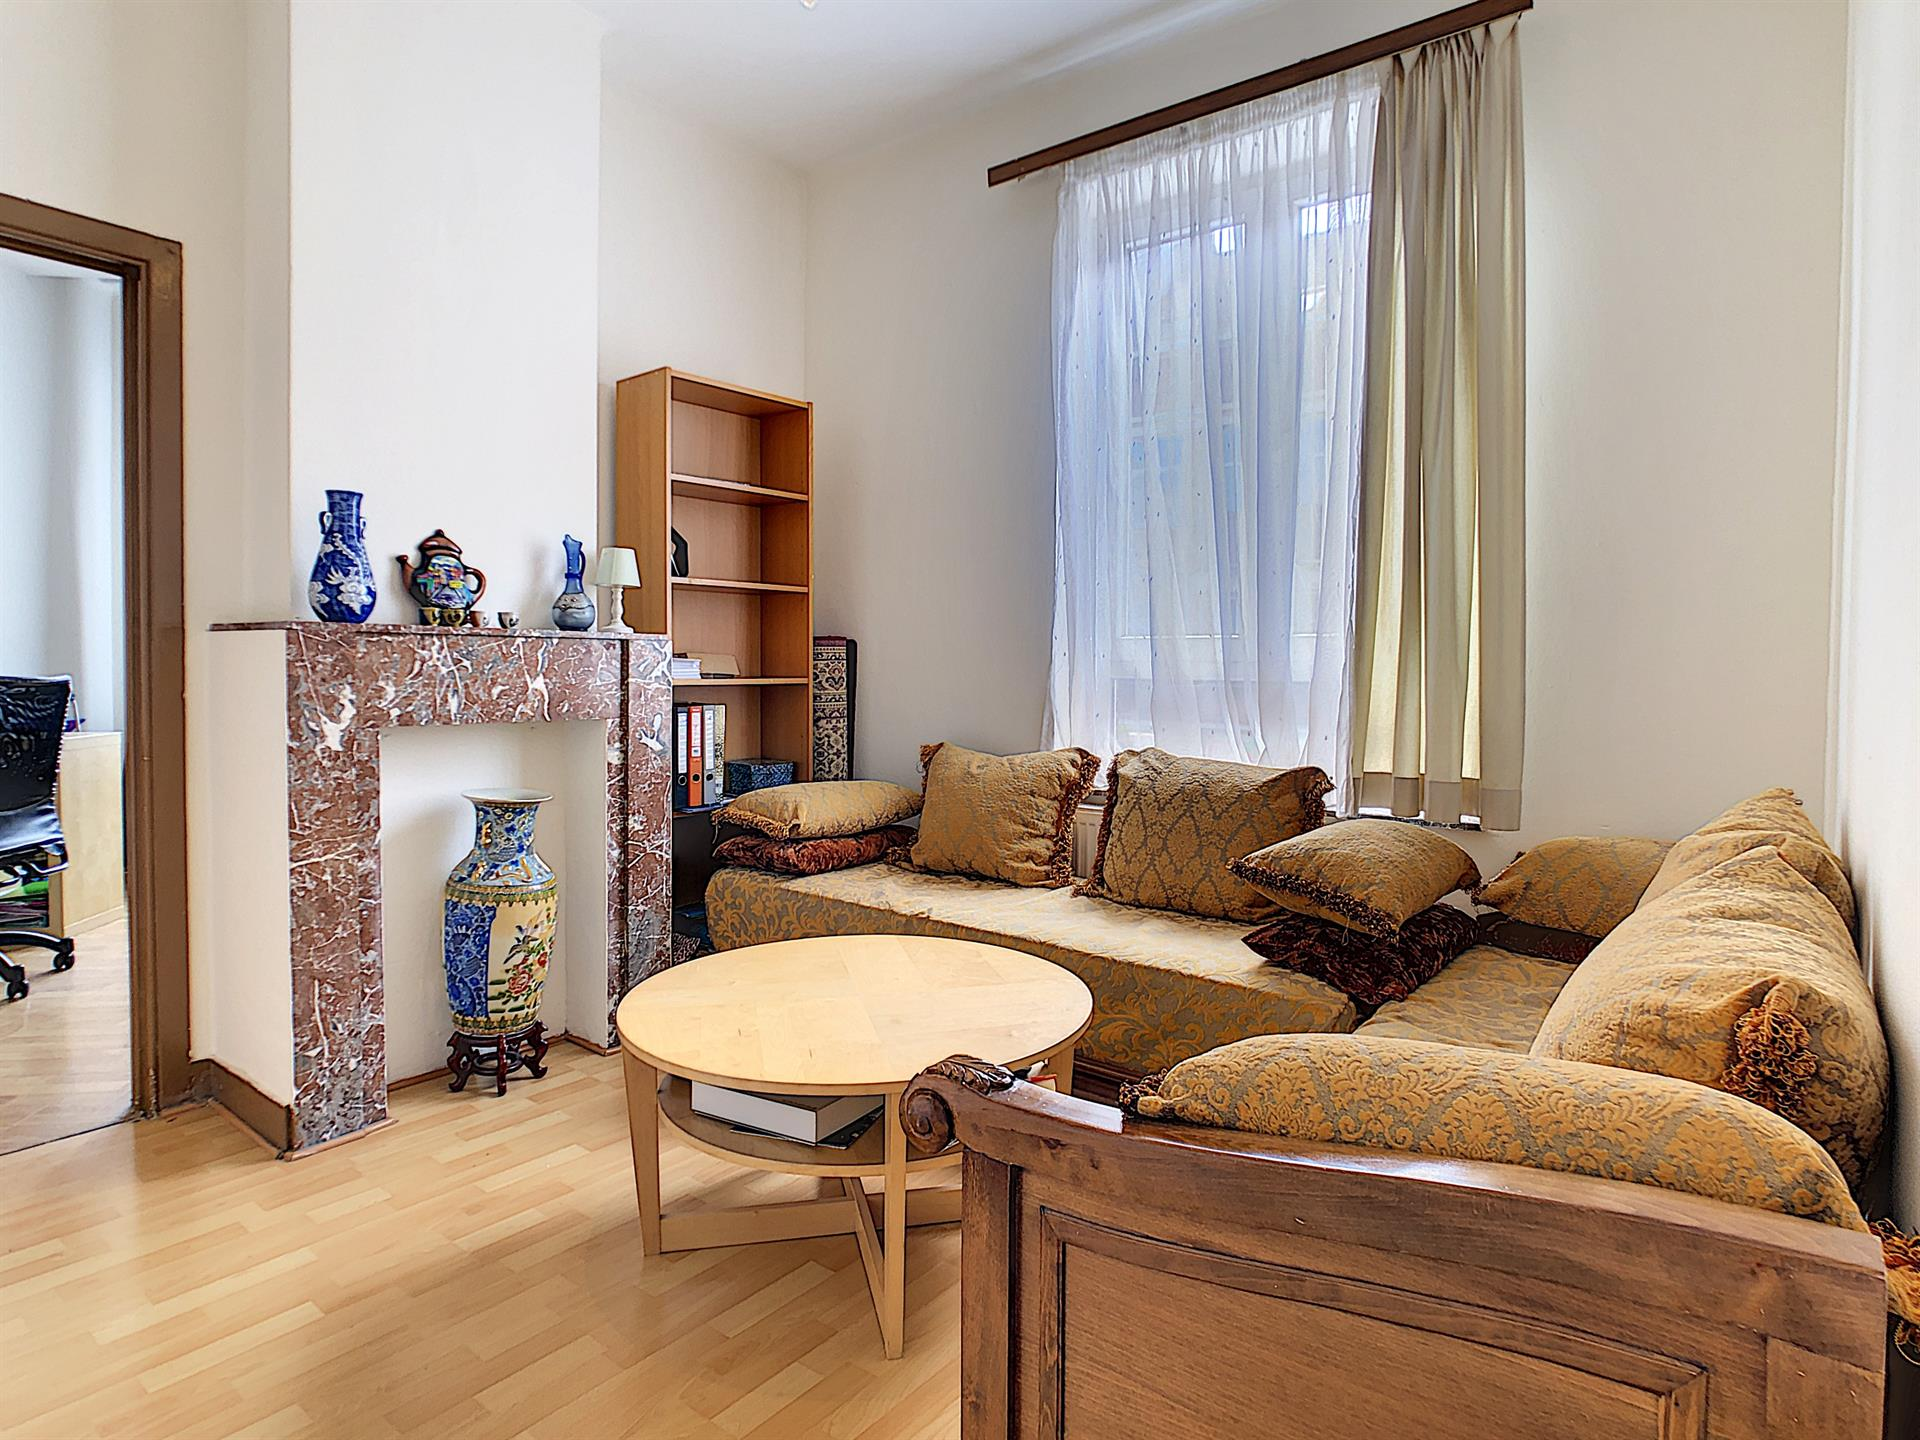 Appartement - Molenbeek-Saint-Jean - #4443903-1